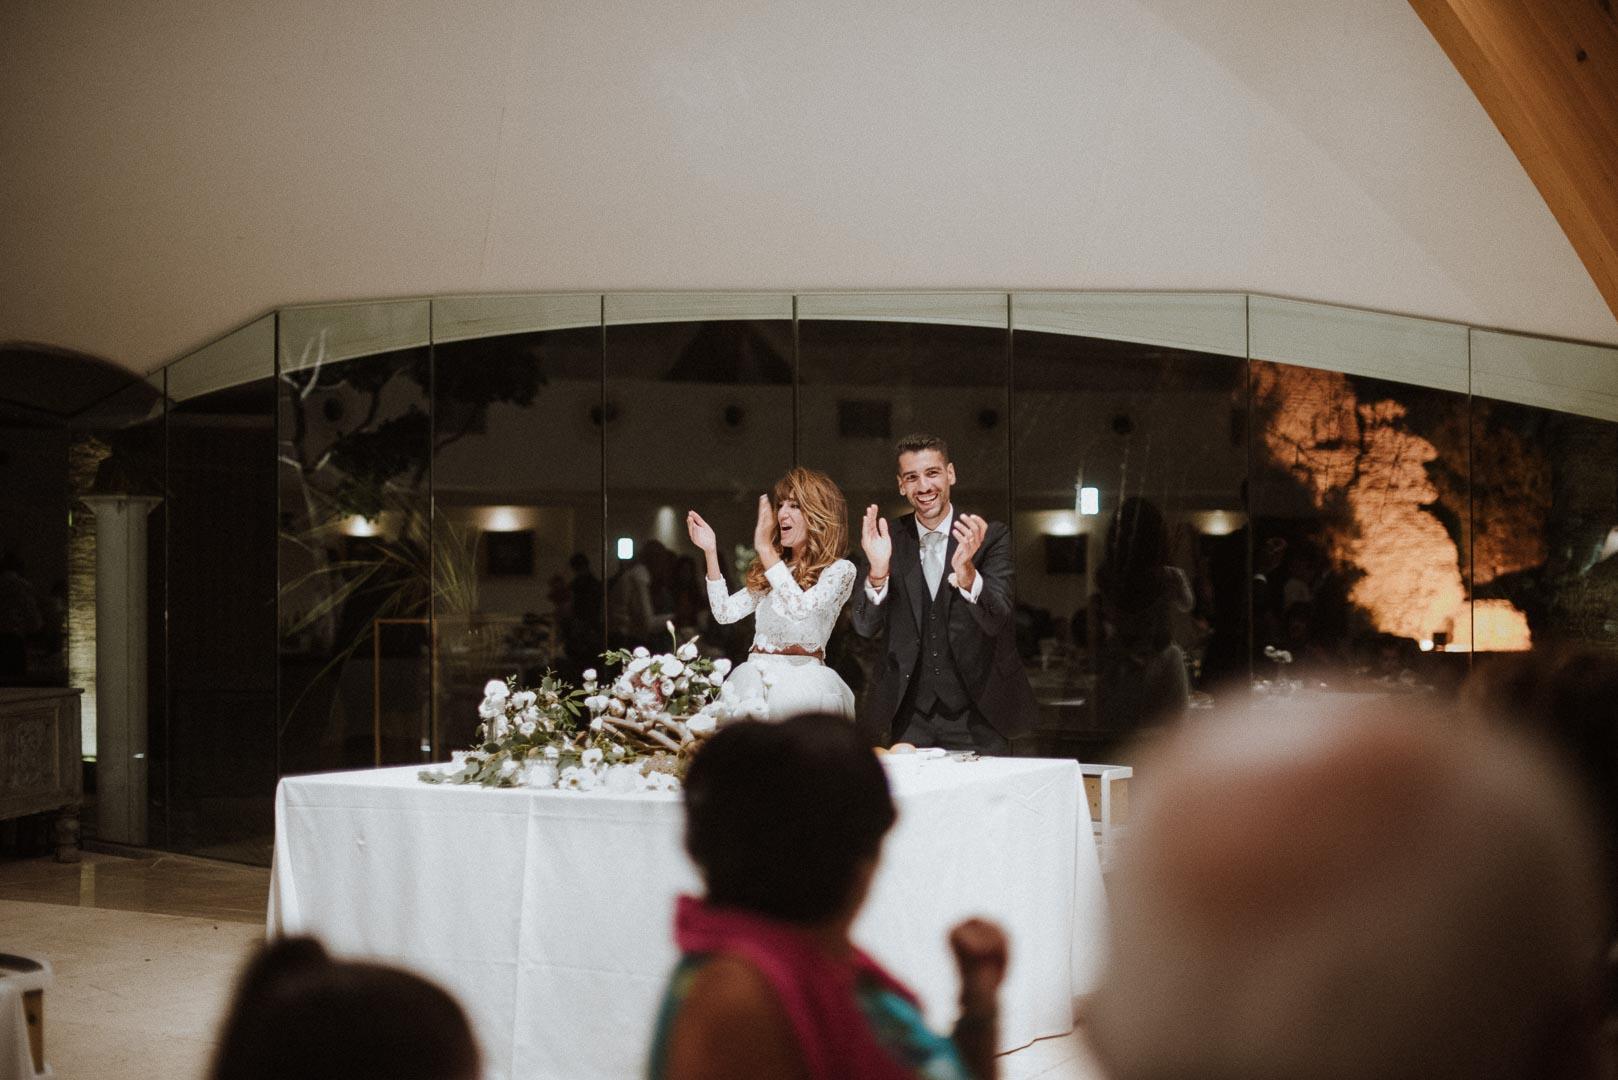 wedding-photographer-destination-fineart-bespoke-reportage-napoli-nabilah-vivianeizzo-spazio46-173